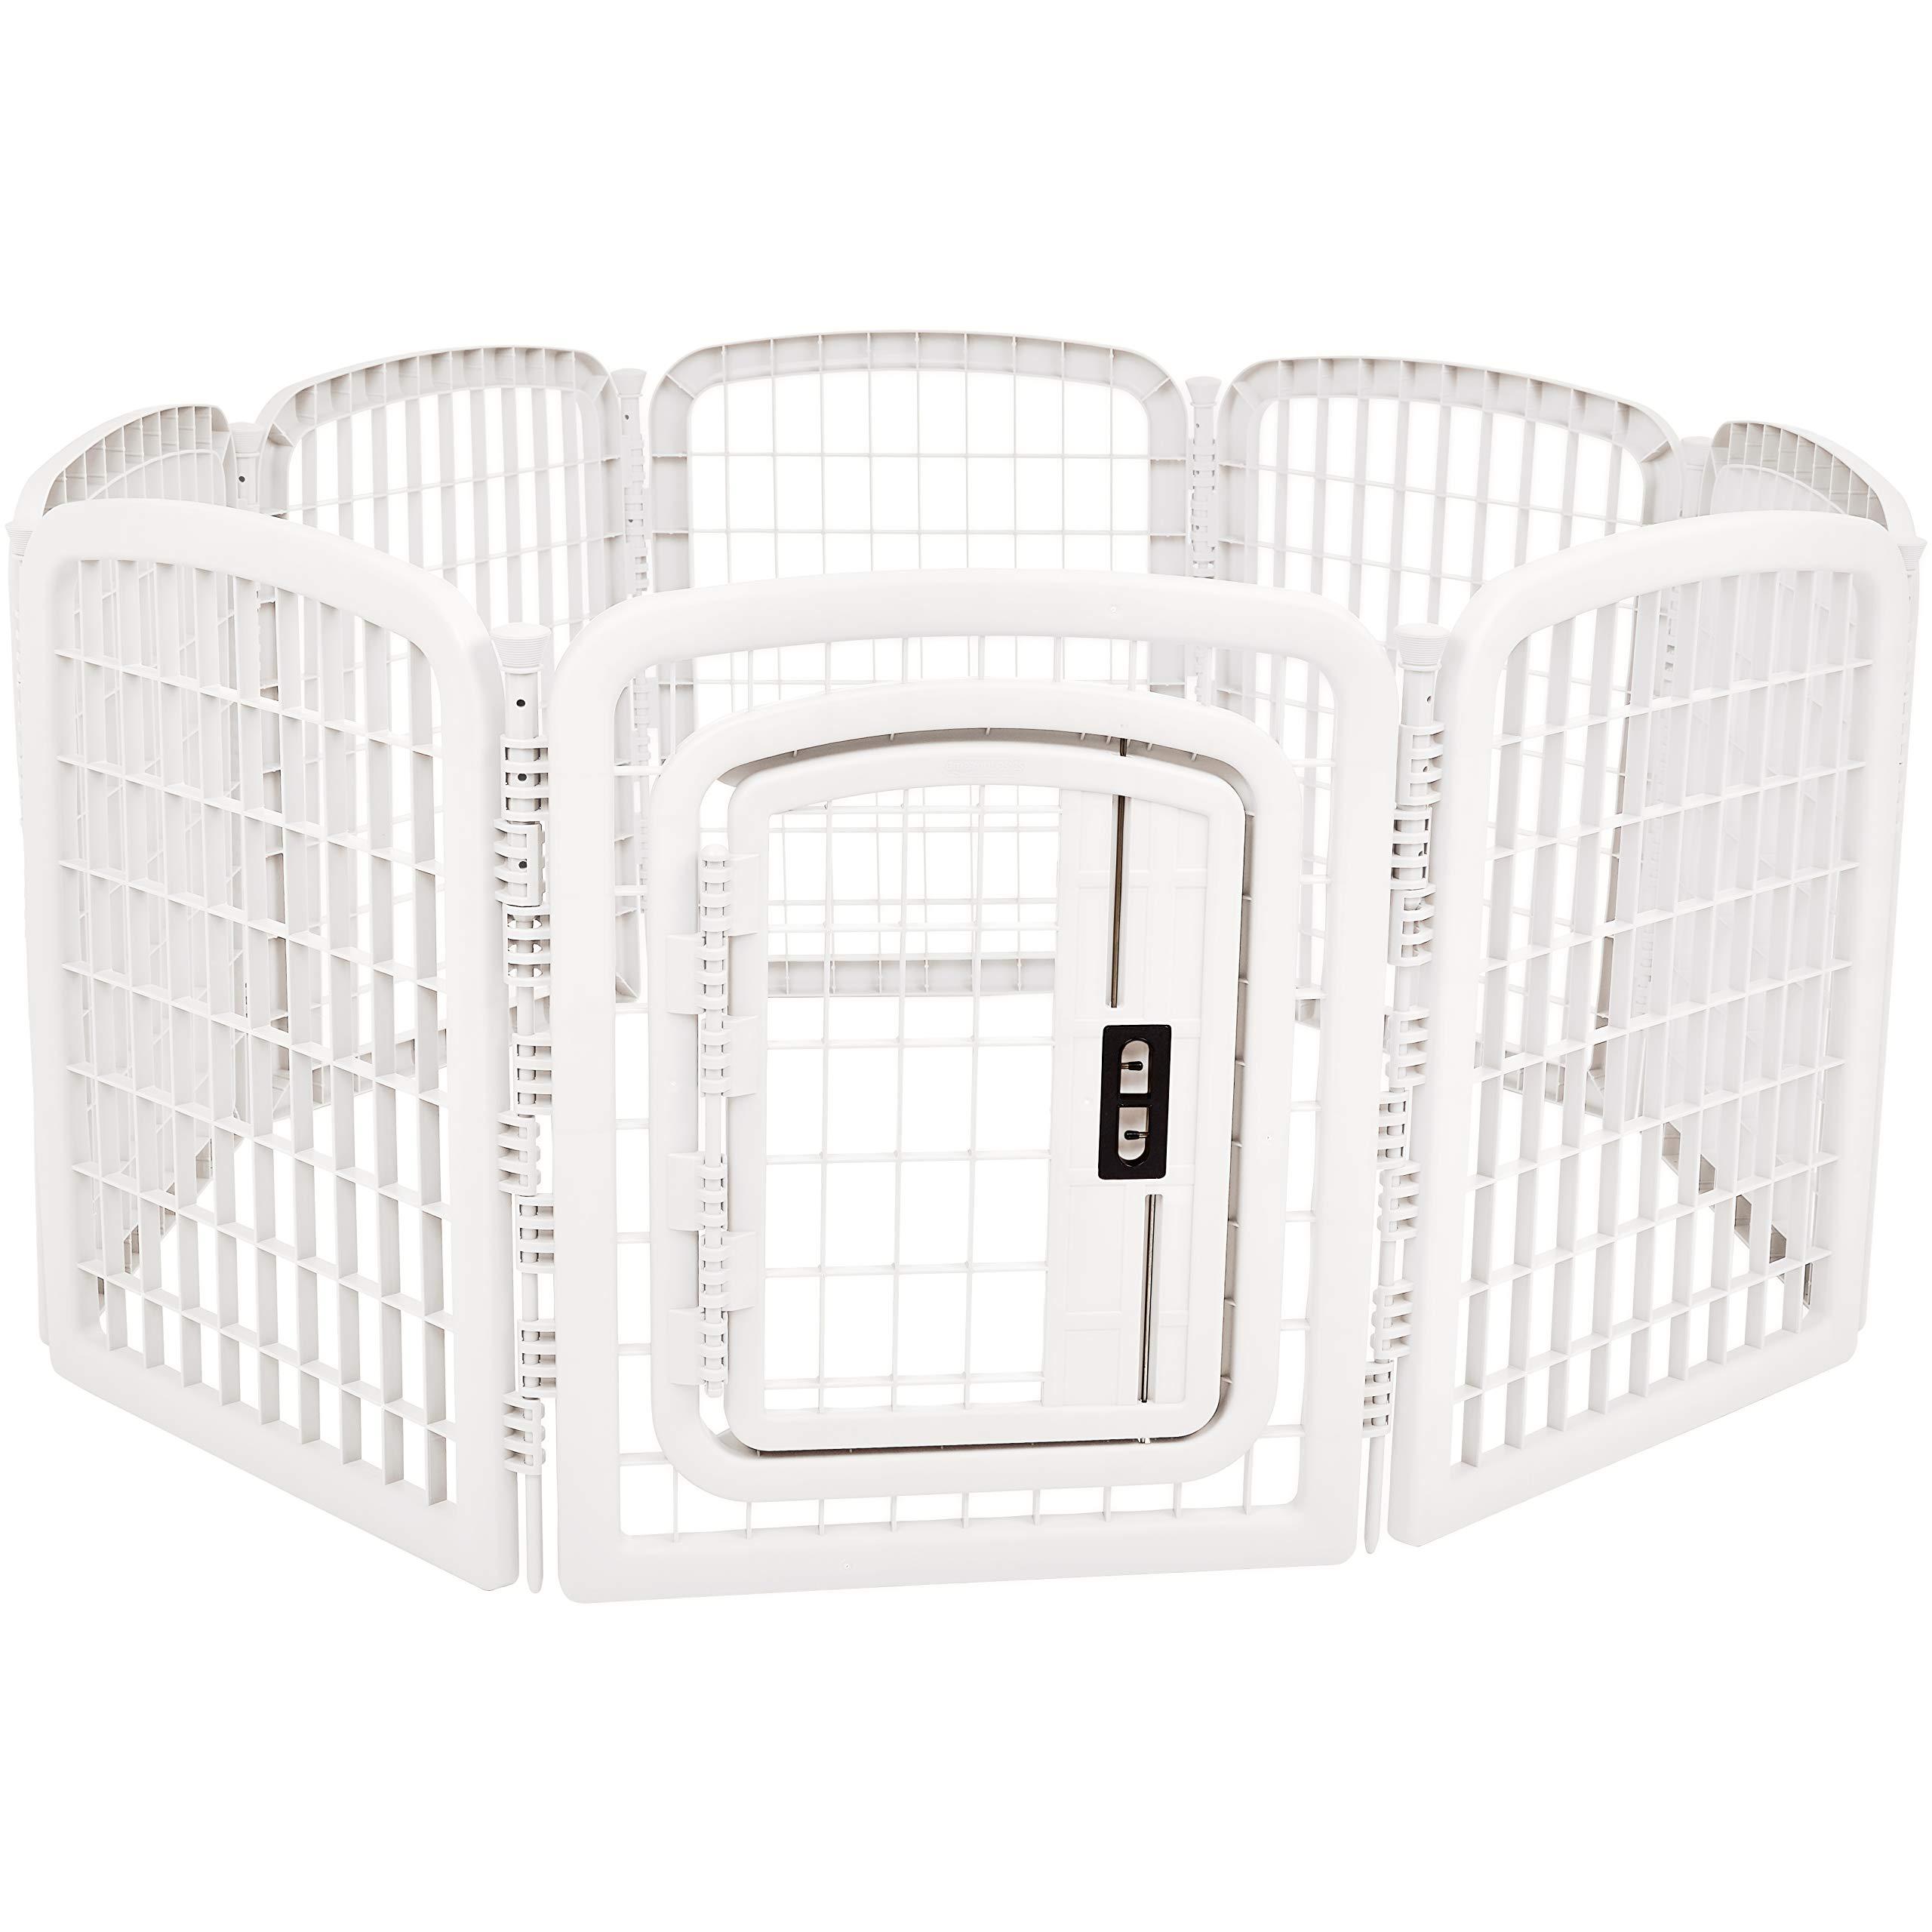 AmazonBasics 8-Panel Plastic Pet Pen Fence Enclosure With Gate - 59 x 58 x 28 Inches, White